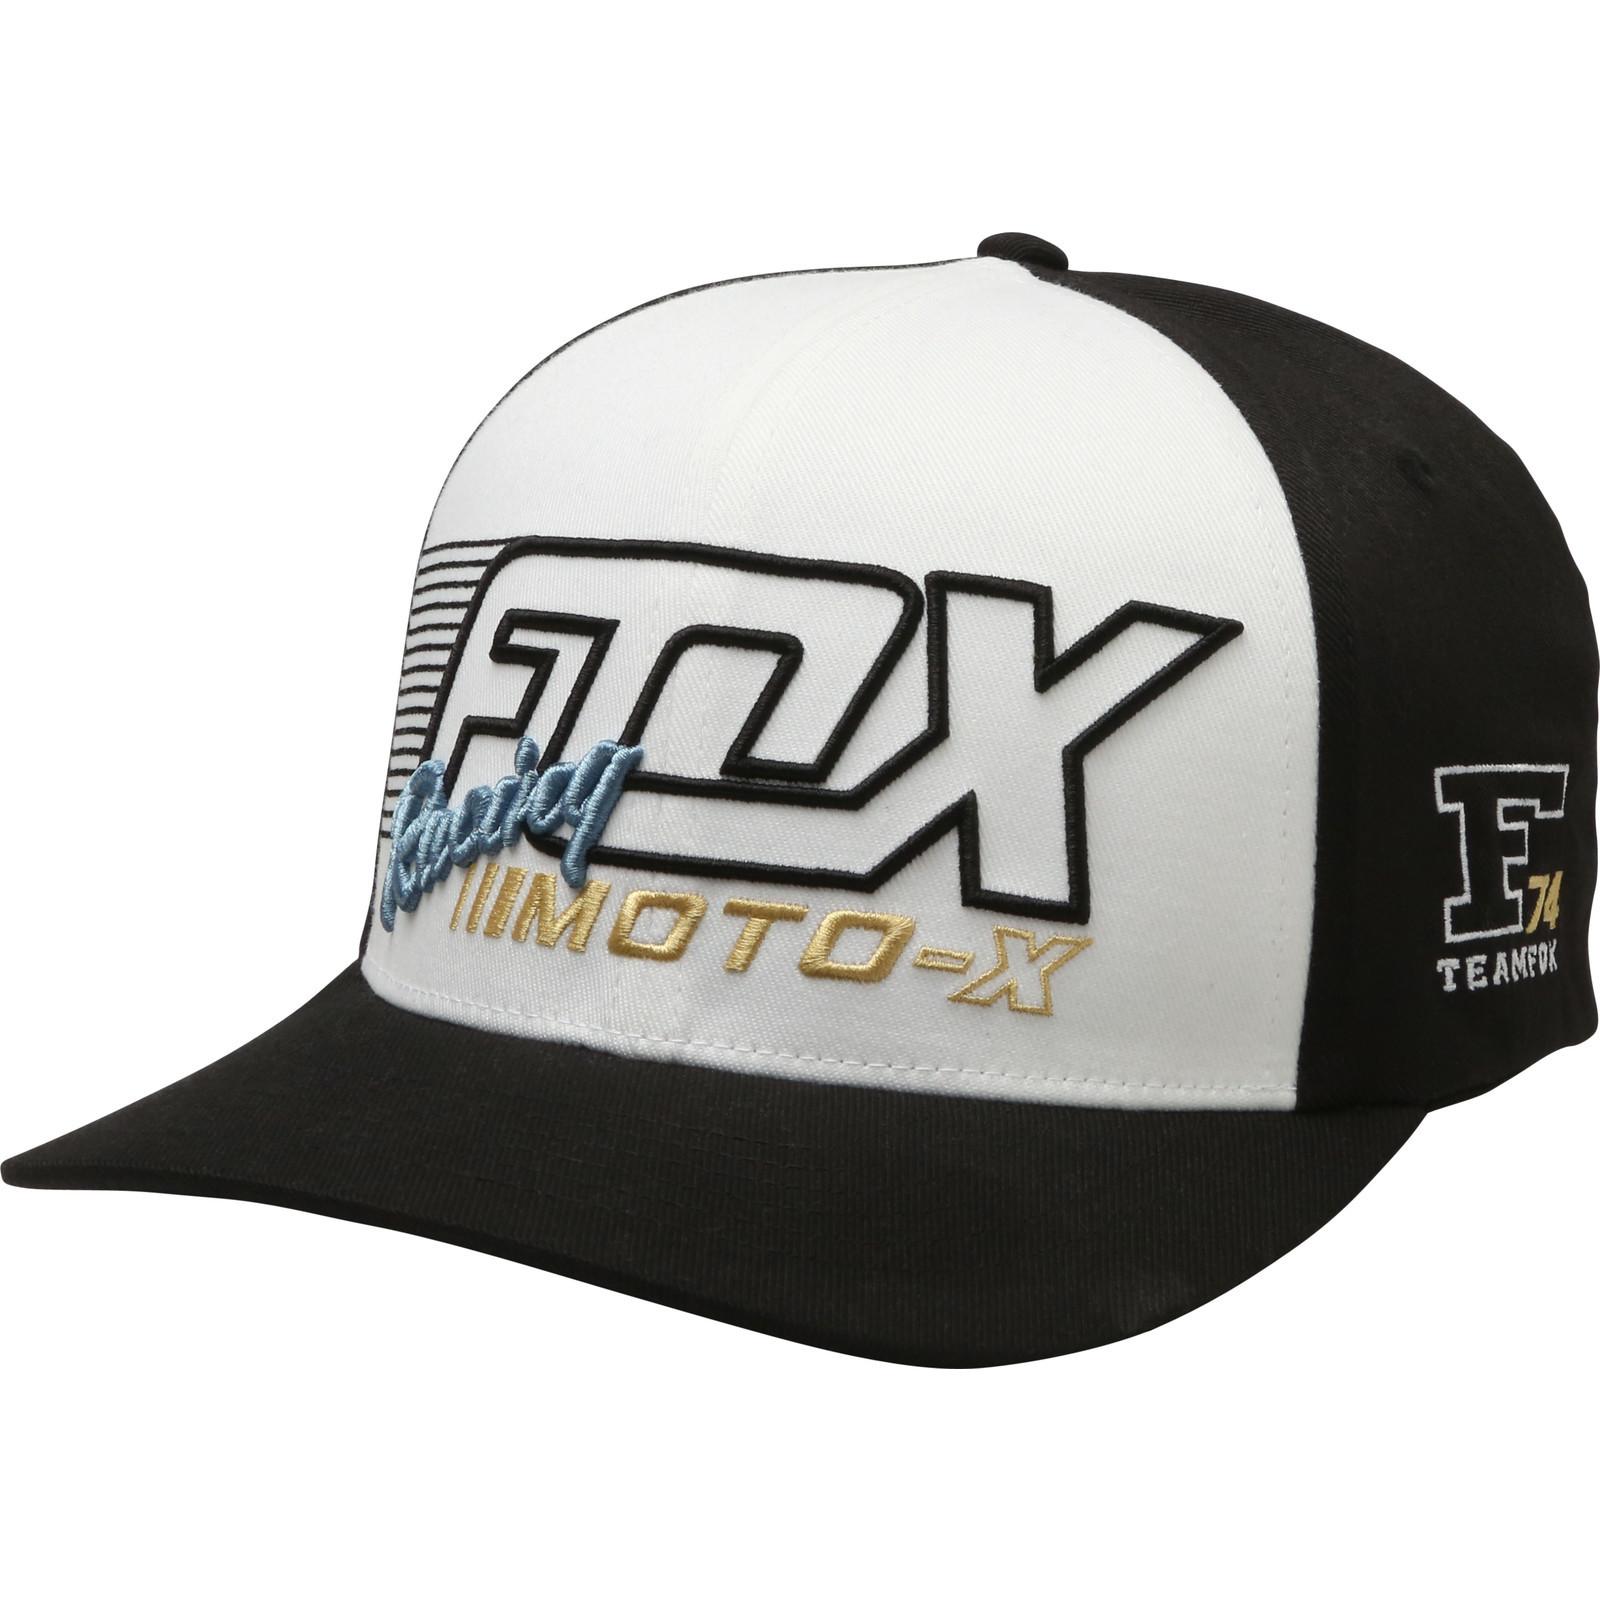 149ceb86c55 Fox Racing Flection Flexfit Cap Mens Moto-X Biker Baseball Hat ...